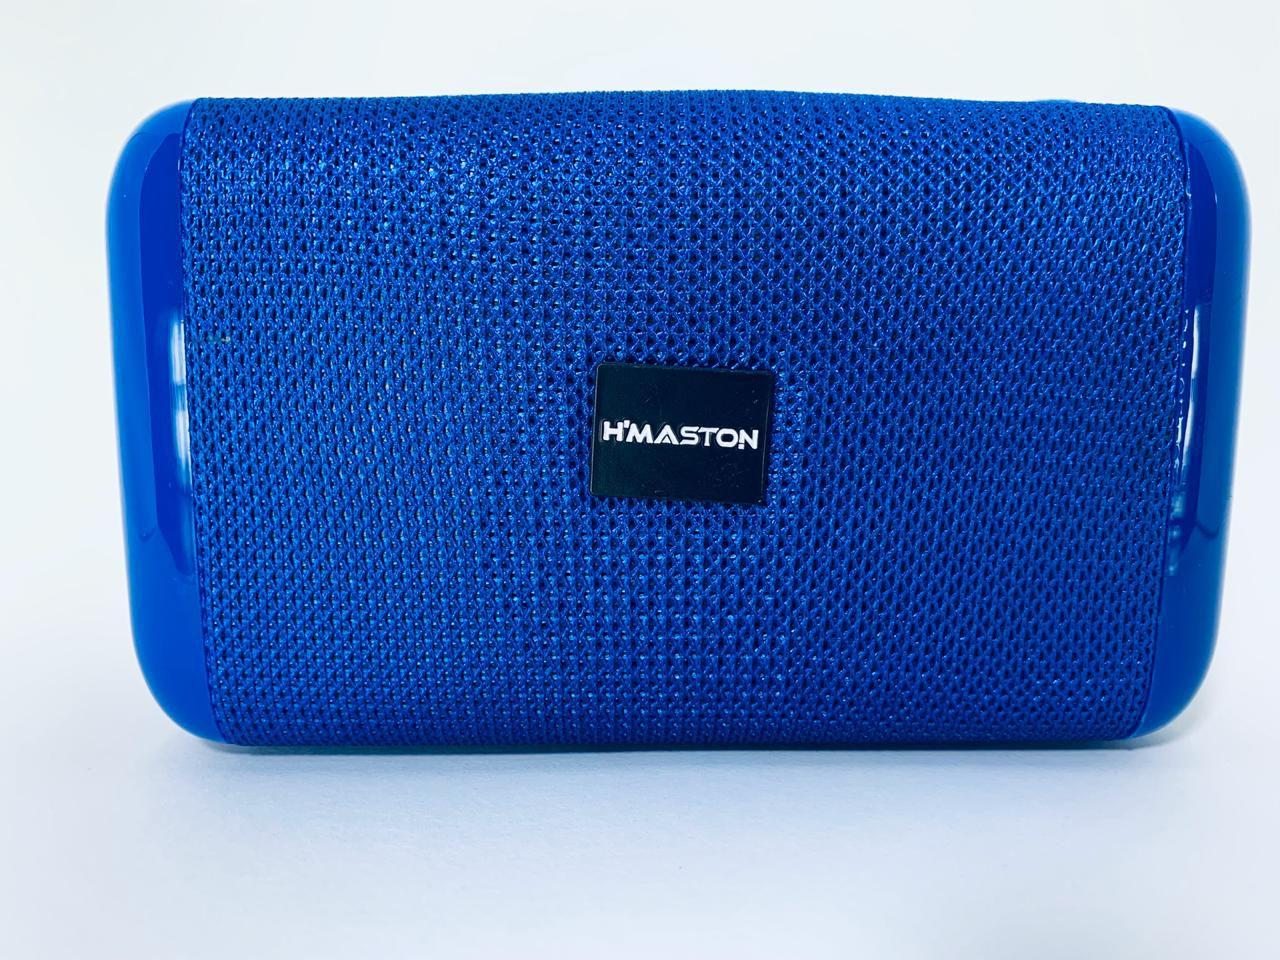 Caixa de som Hmaston YX-163